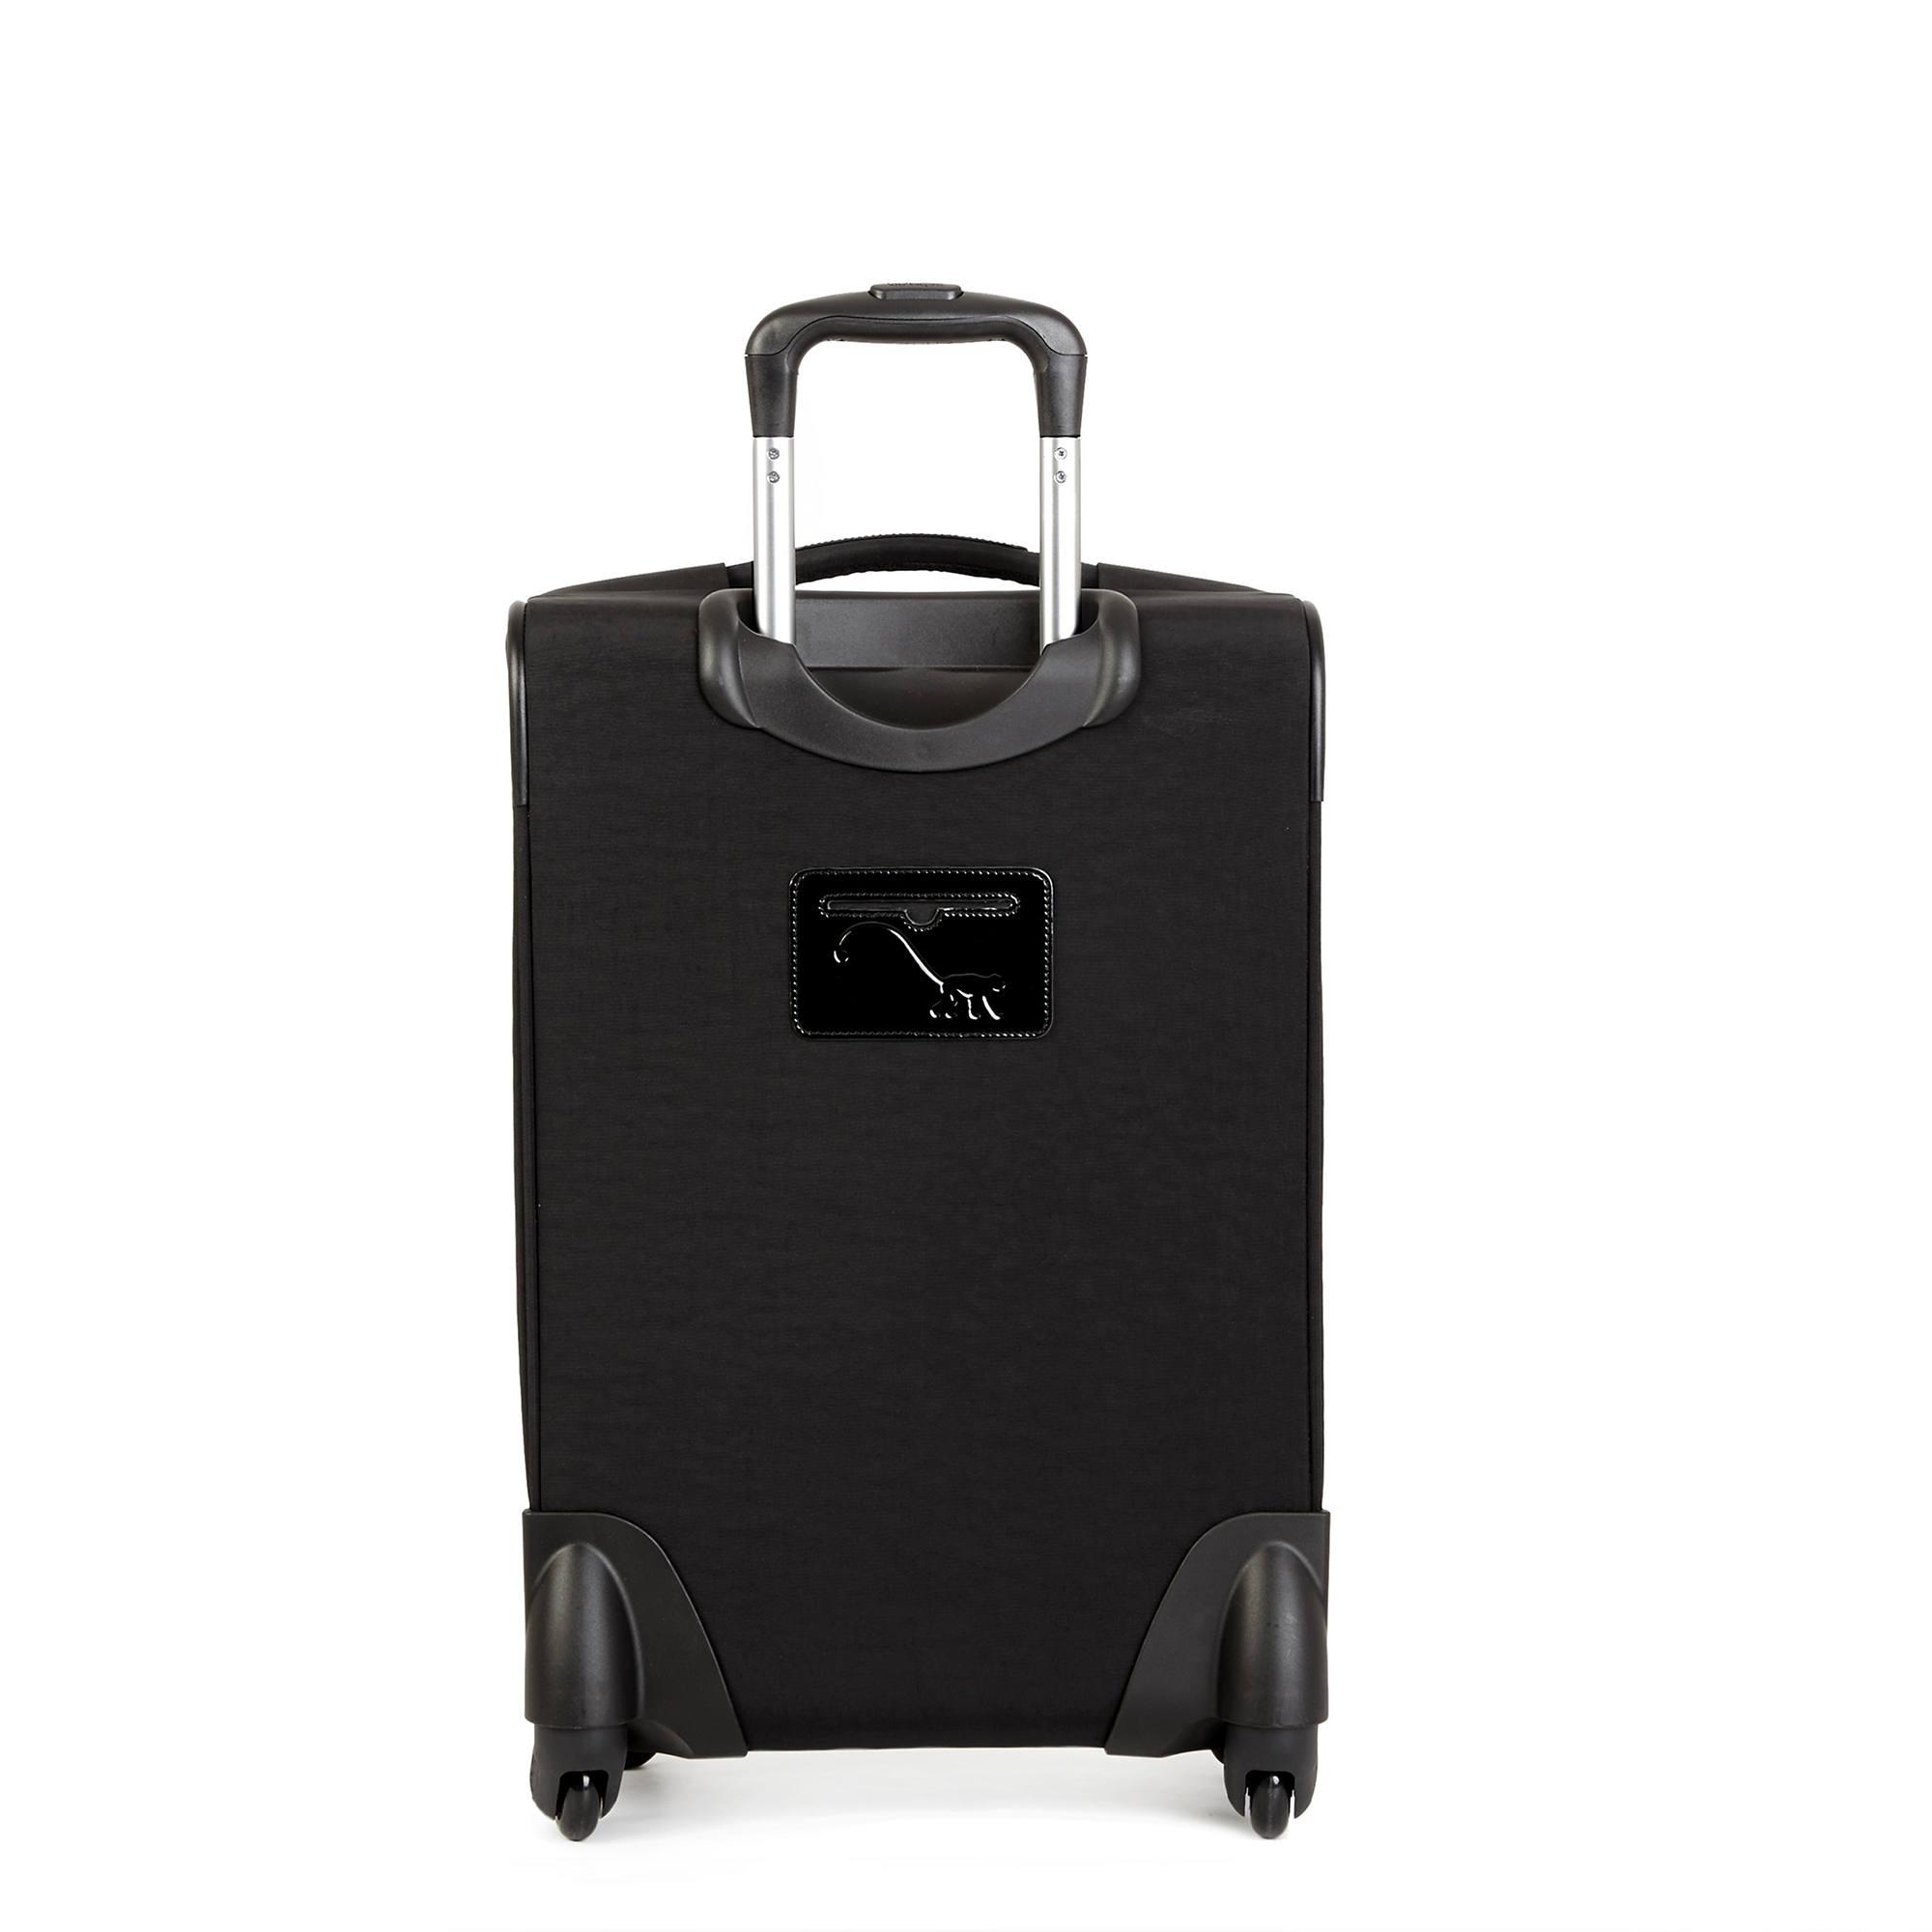 Ronan Carry-On Rolling Luggage | Kipling